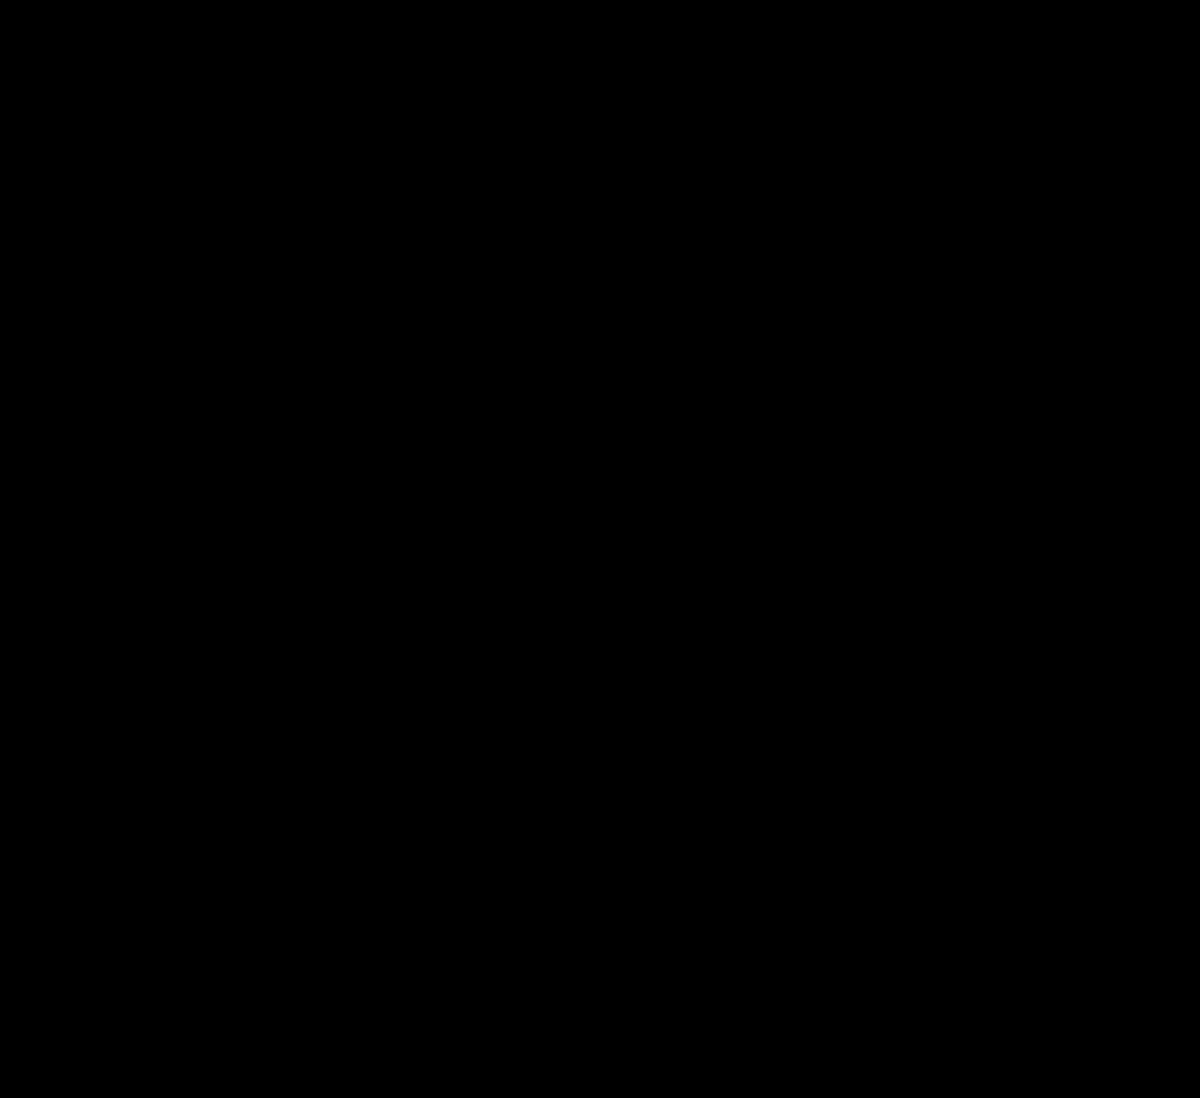 pearl-izumi-logo.png